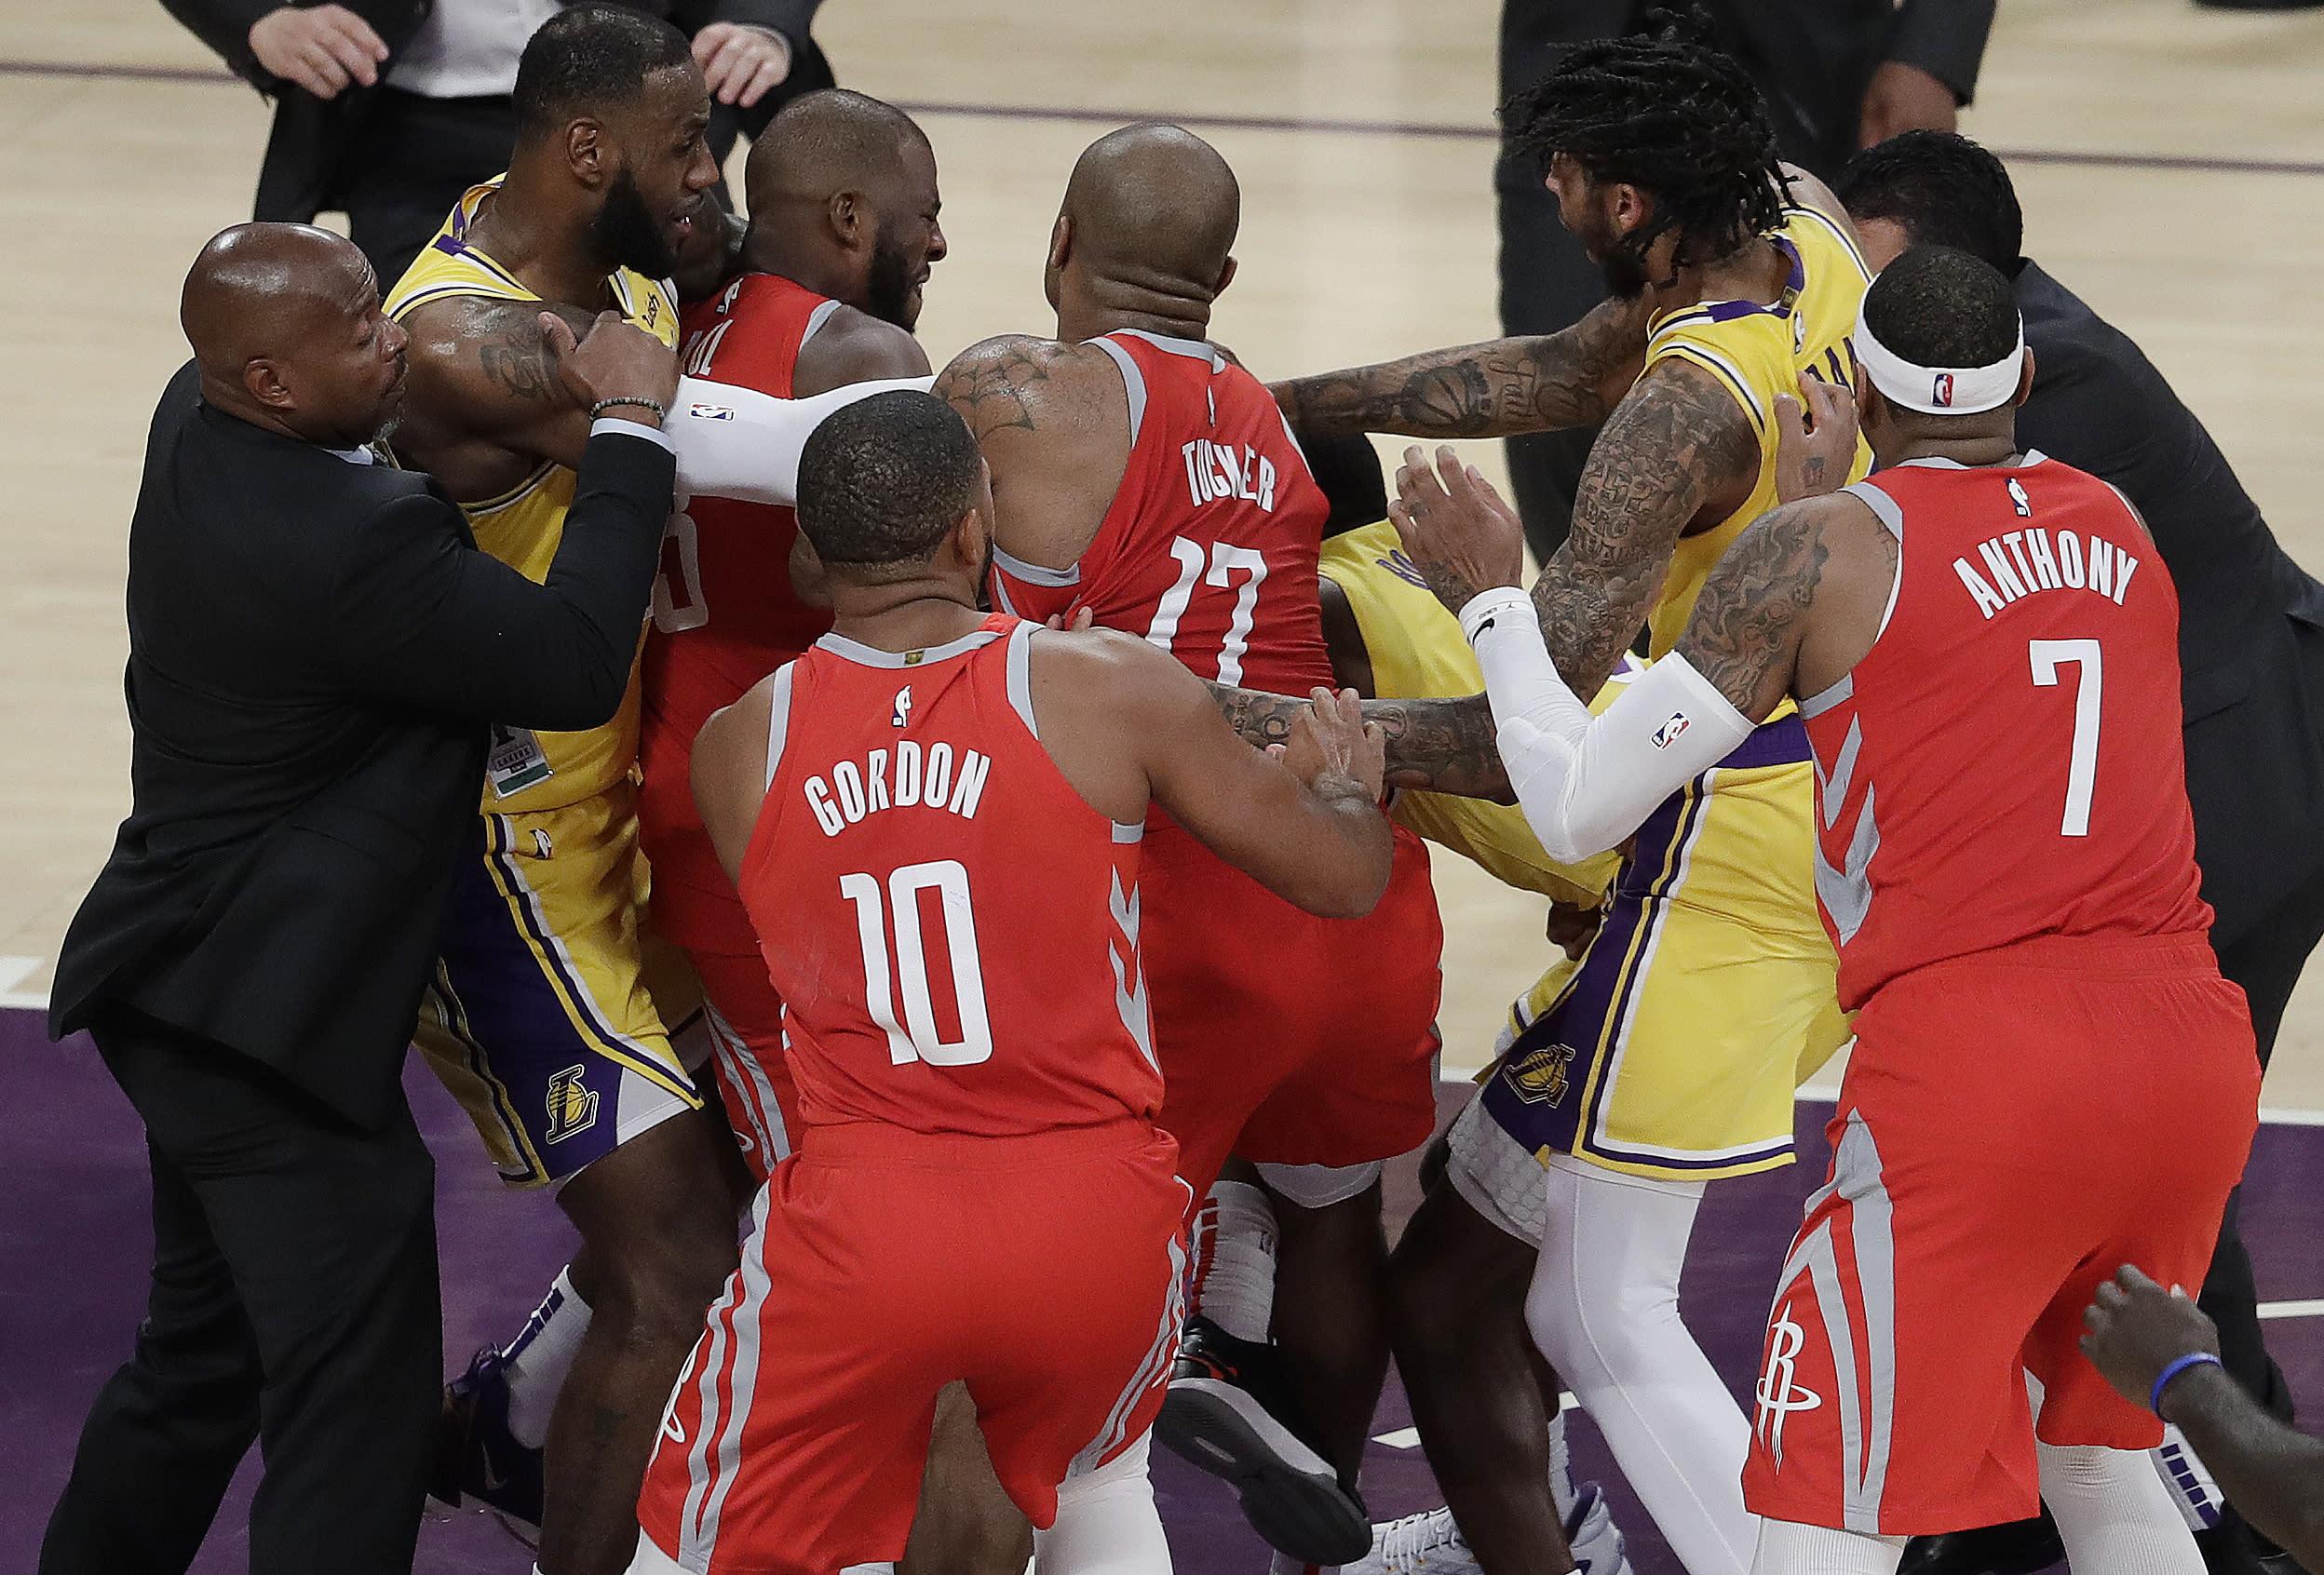 【NBA】箭湖亂鬥懲處你覺得會太輕嗎?